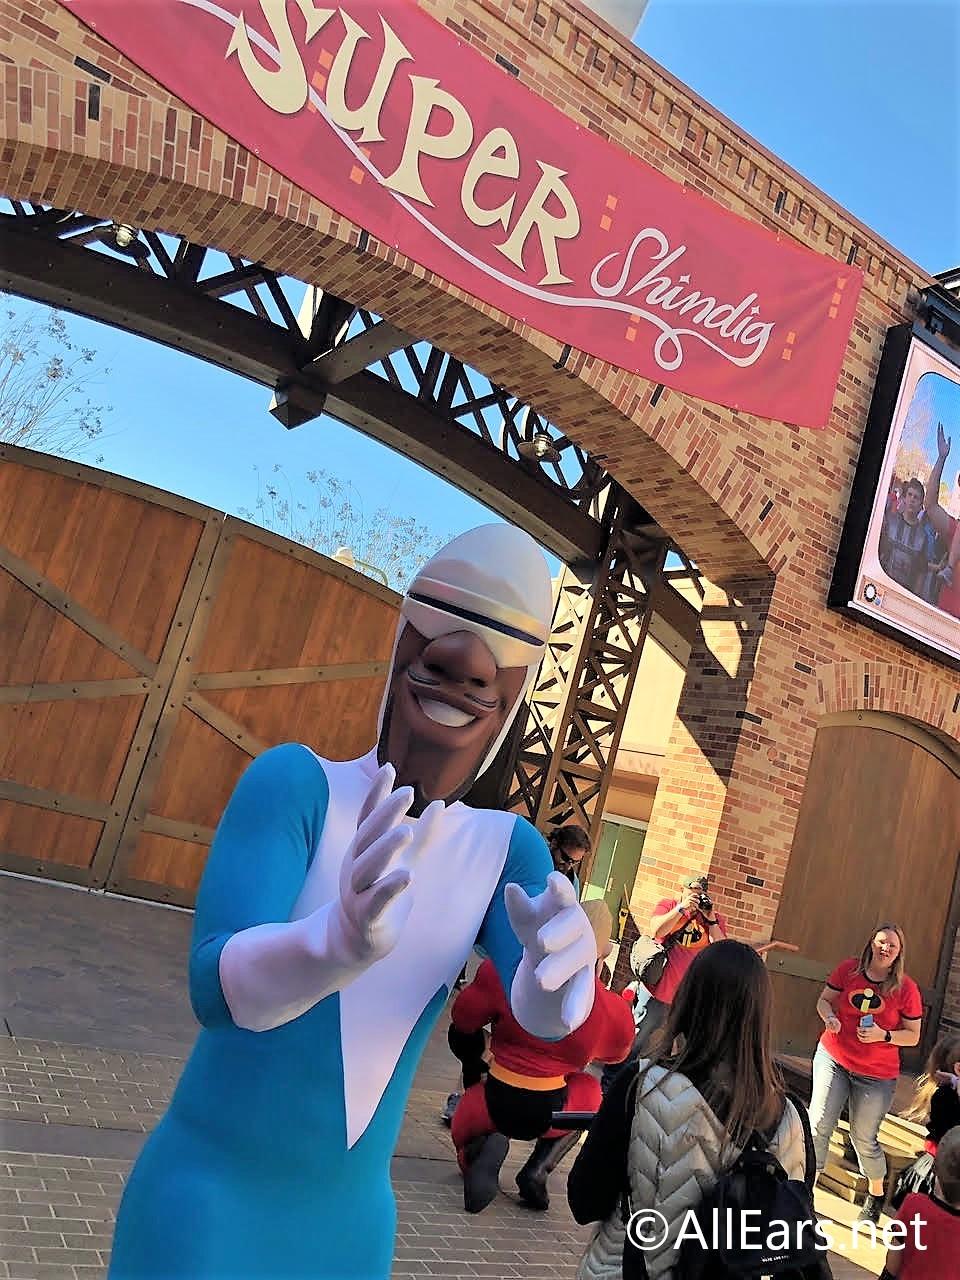 FIRST LOOK Municiberg at Pixar Place in Disneys